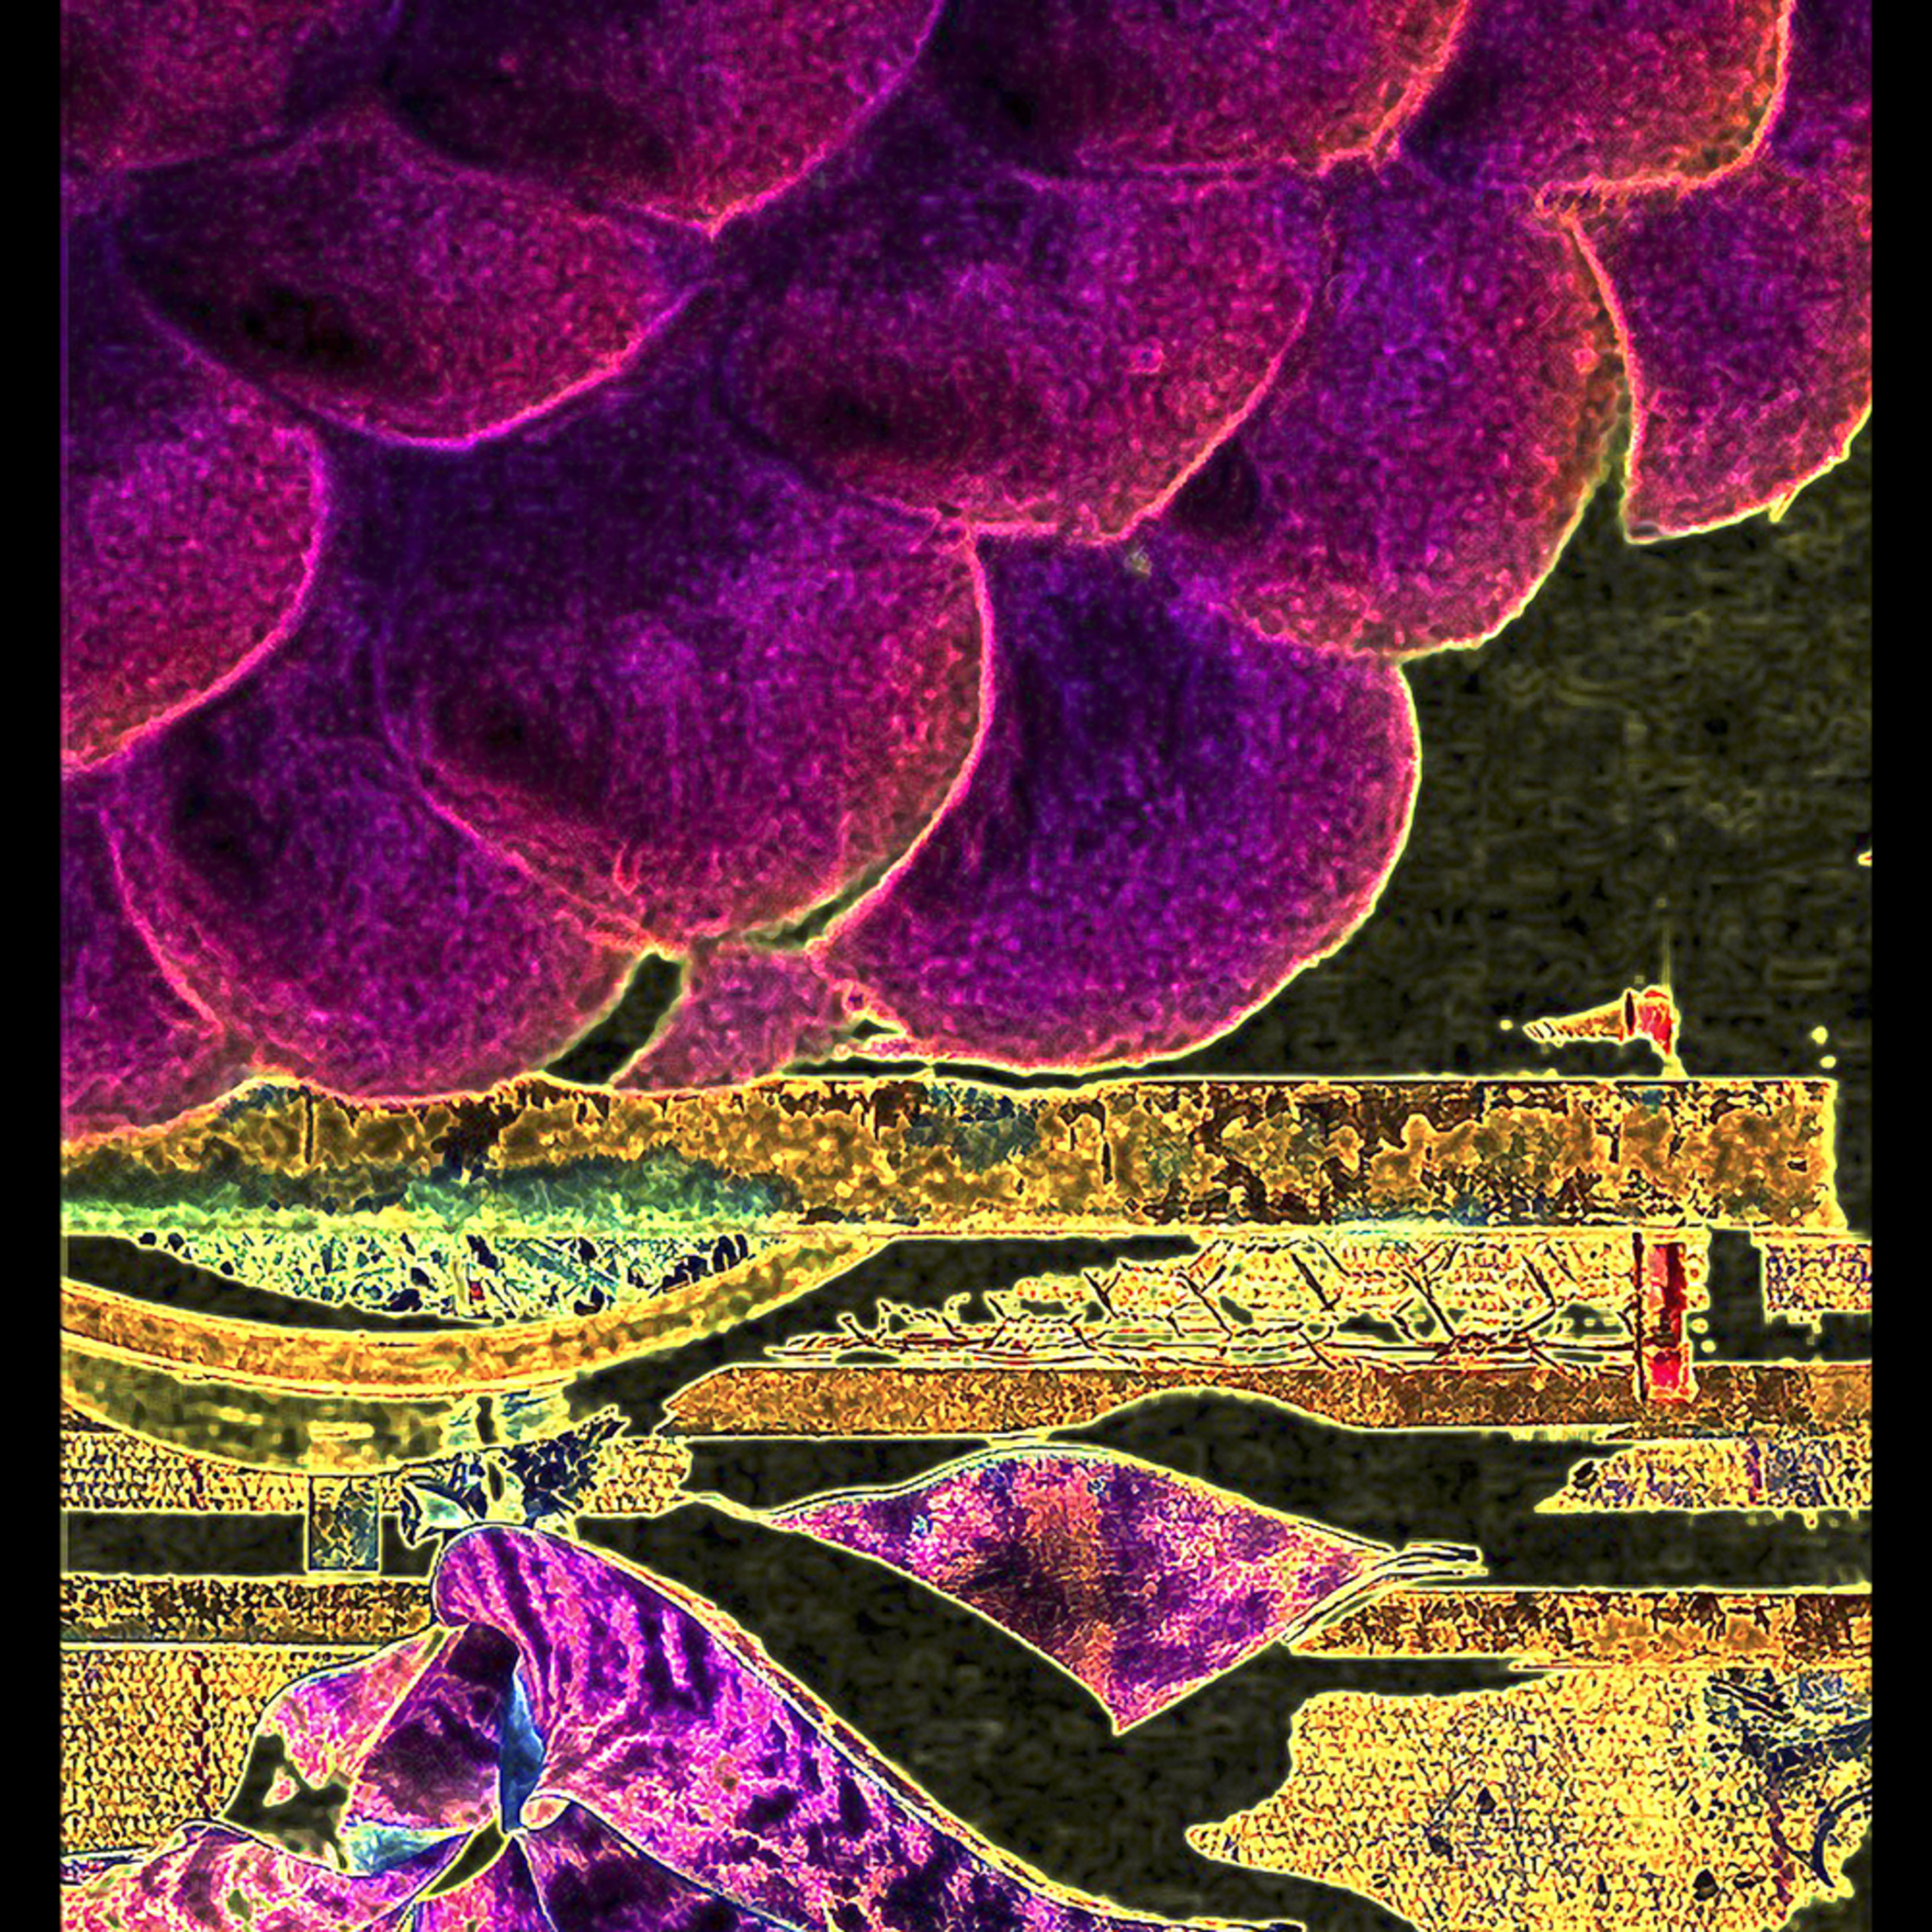 Grape fest asf2 txywa6